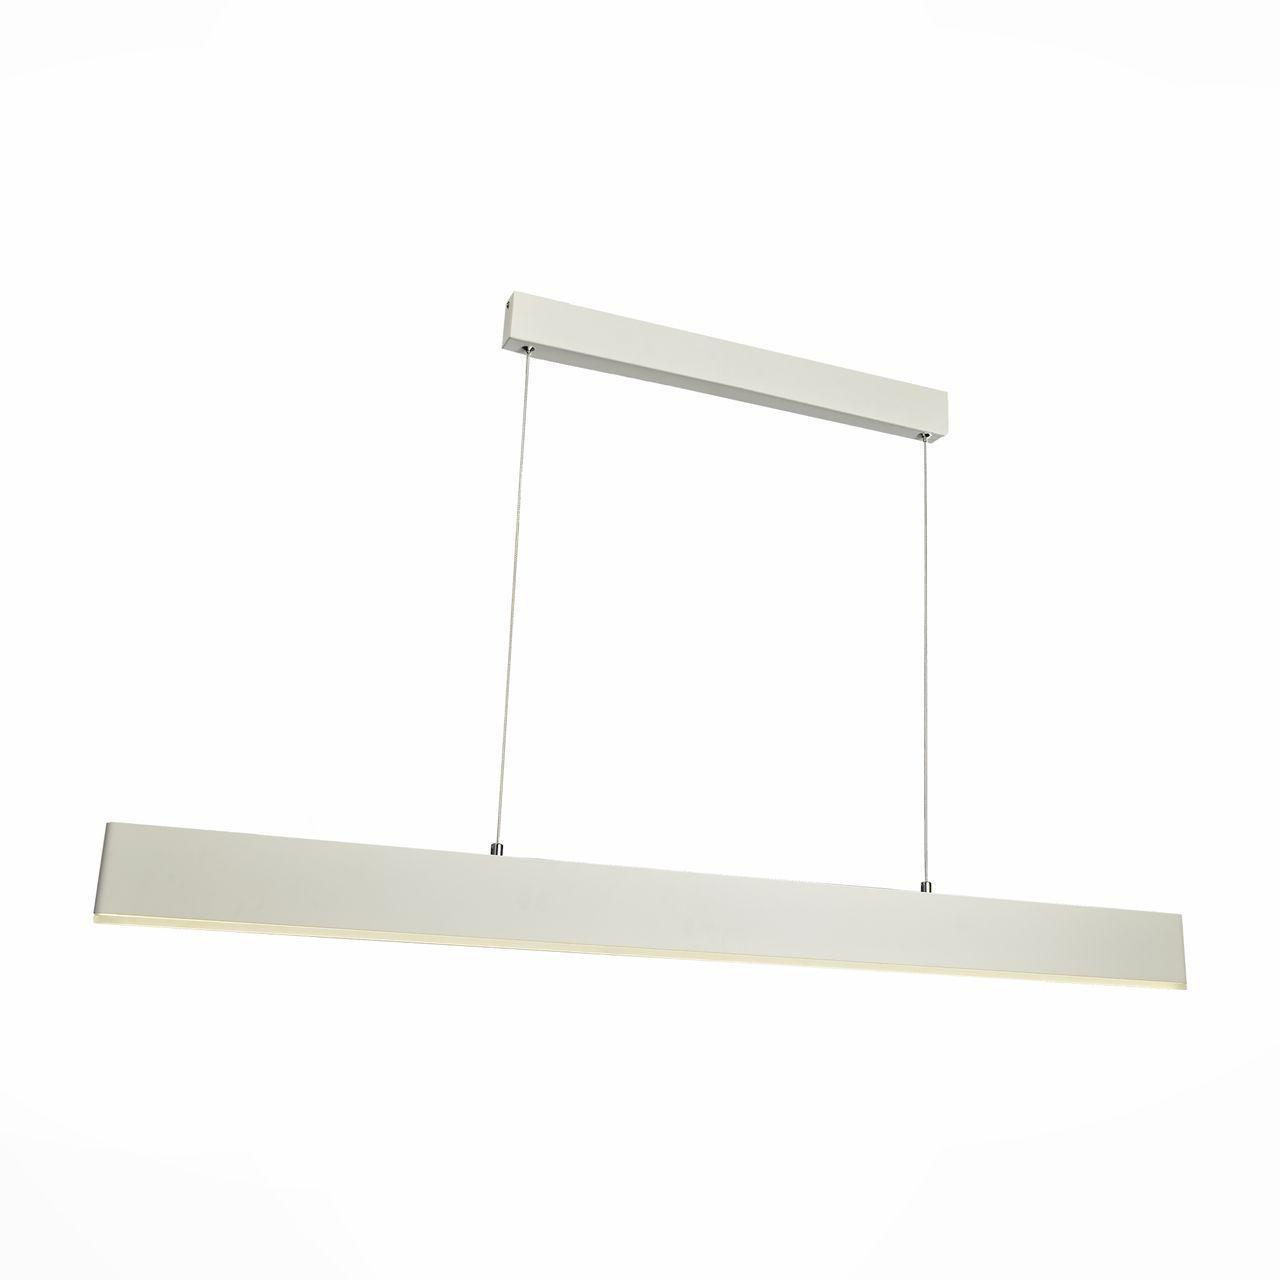 Фото - Подвесной светильник ST Luce SL567.553.01, белый светильник подвесной st luce trina sl274 503 03 3xe27x40w 50 x 50 x 138 см